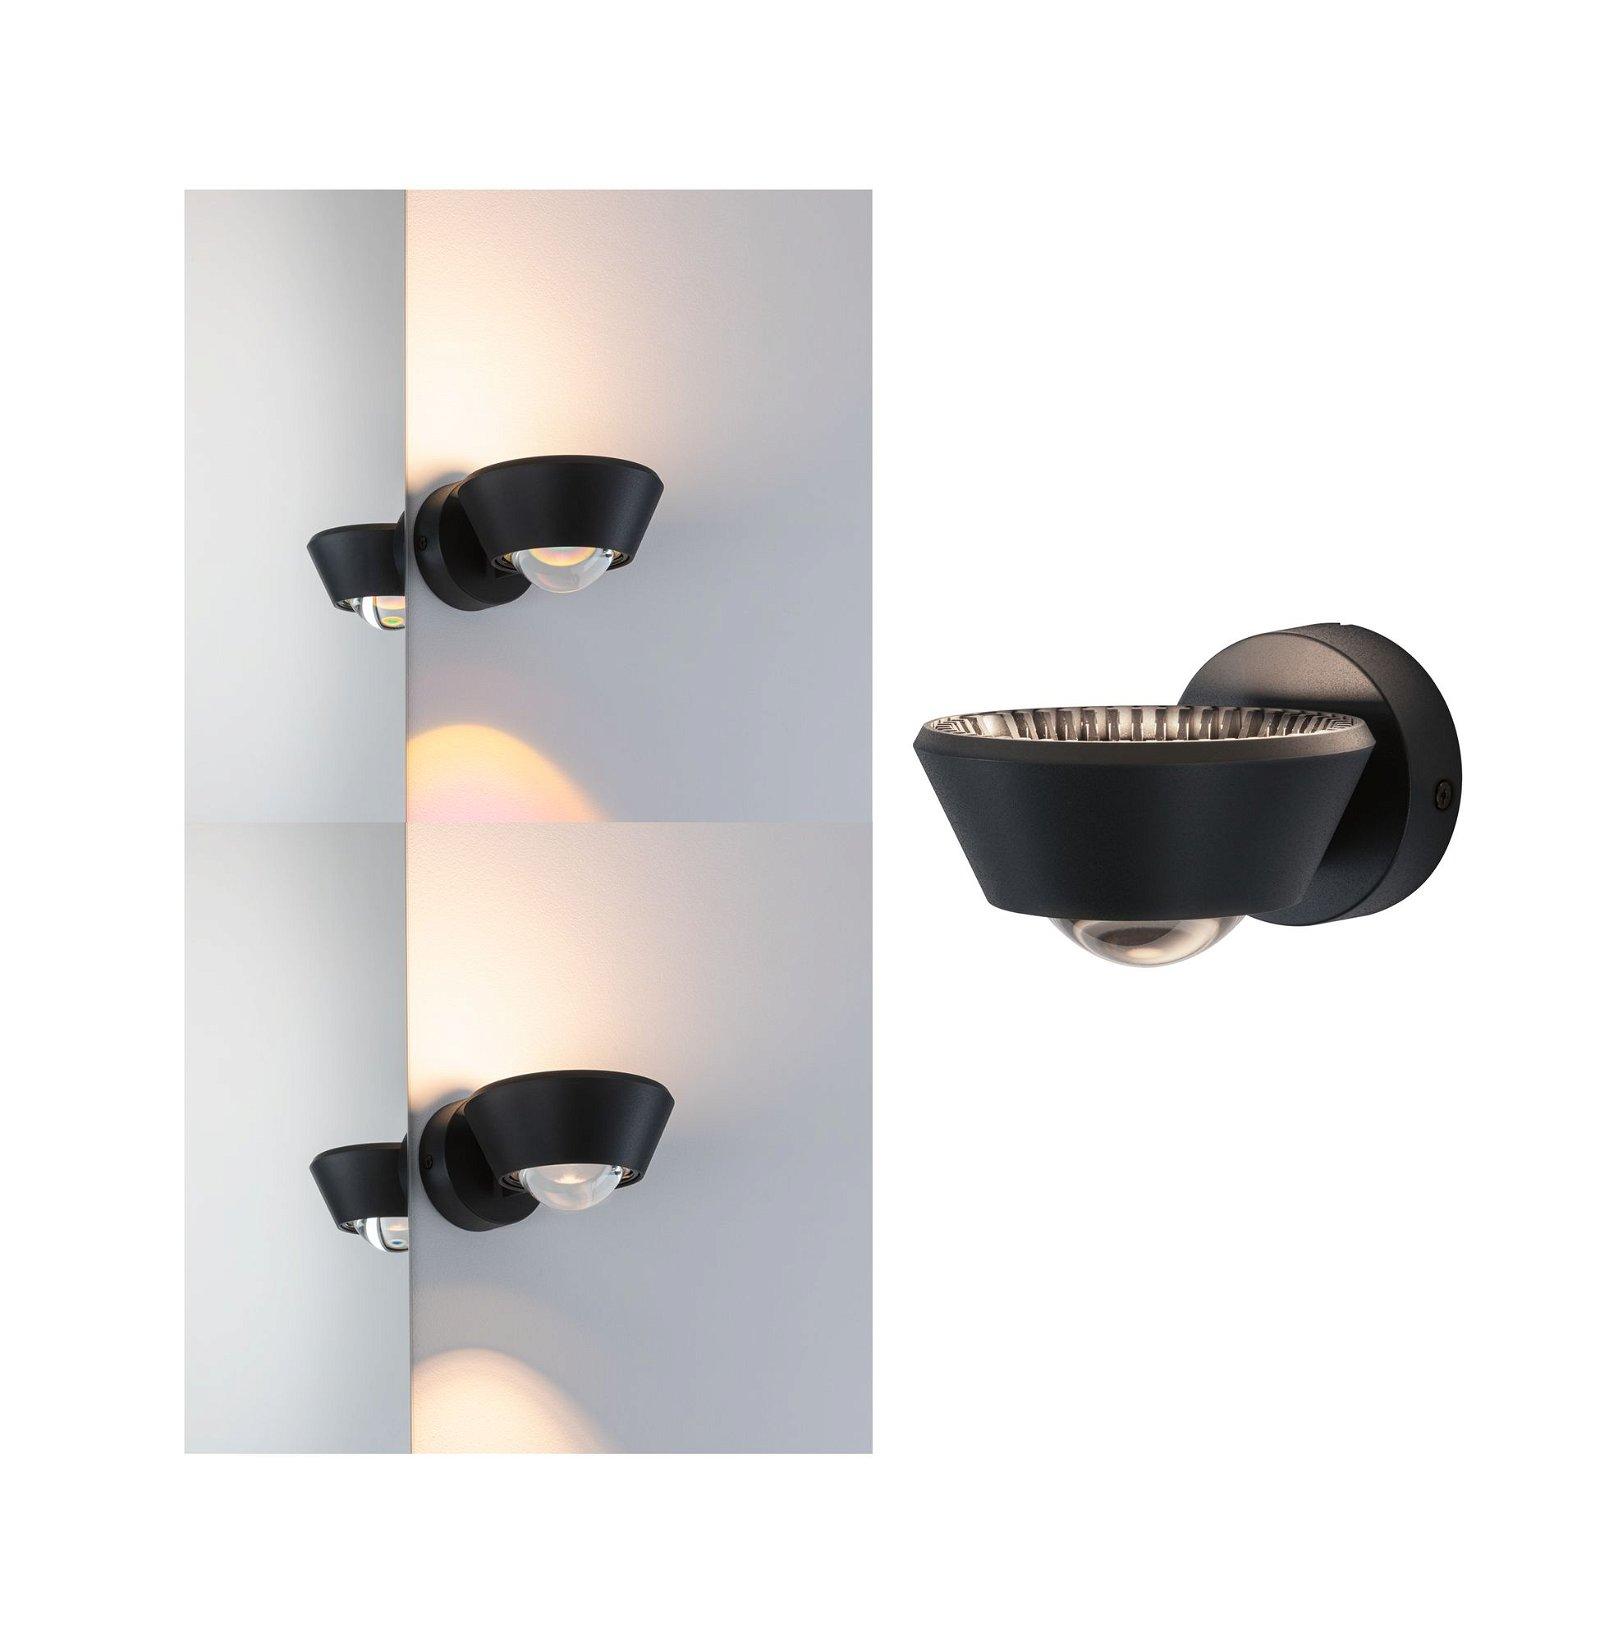 LED Wandleuchte Sabik IP44 2700K 390lm 230V 9 / 1x4W Schwarz